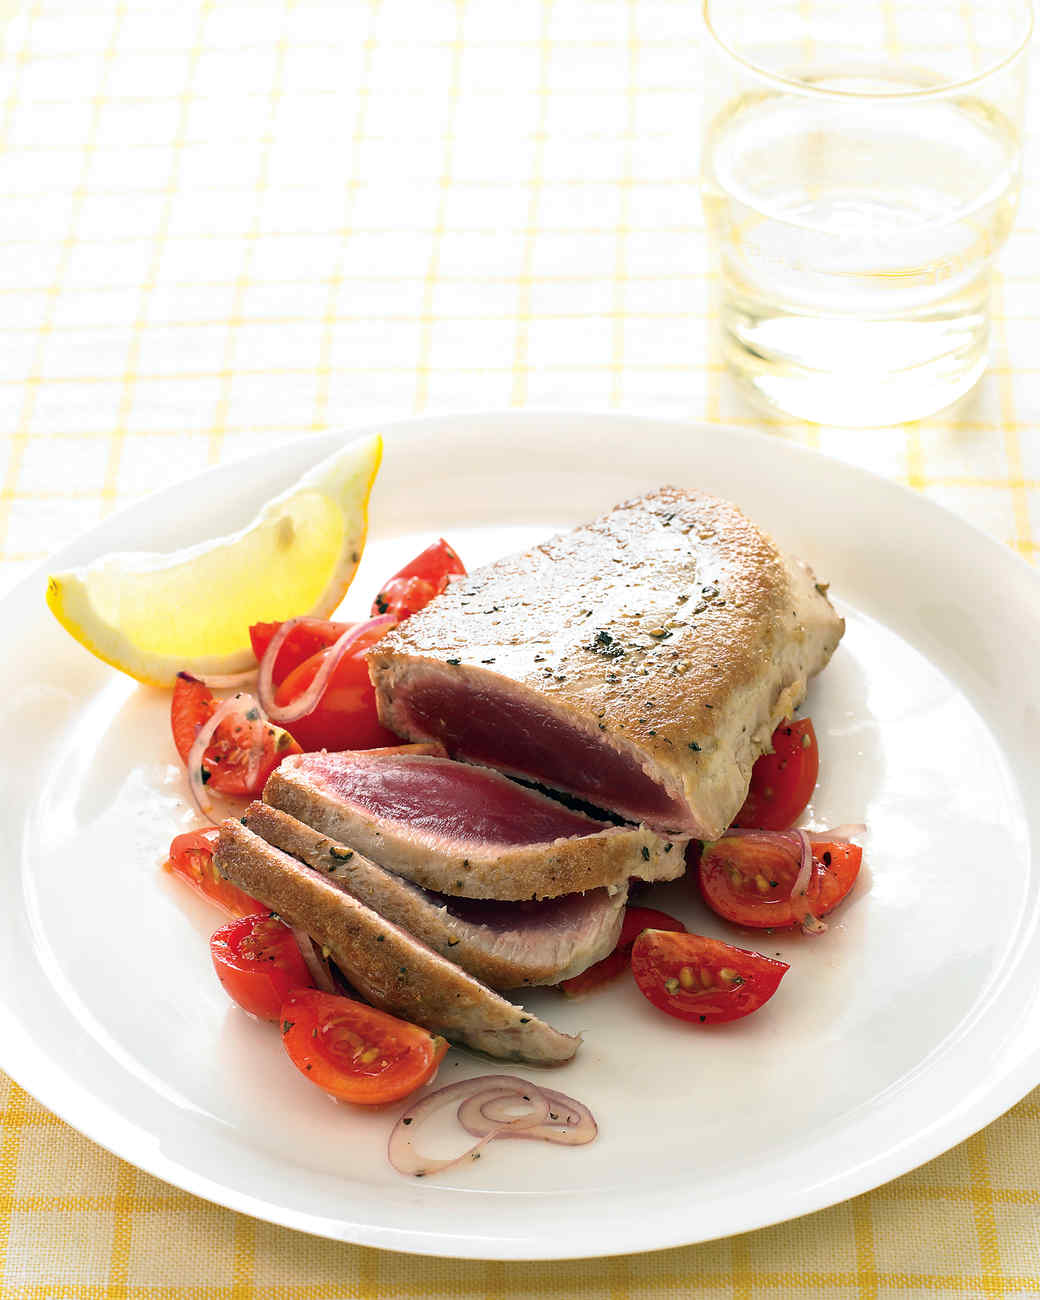 med103841_0608_tuna_steak.jpg